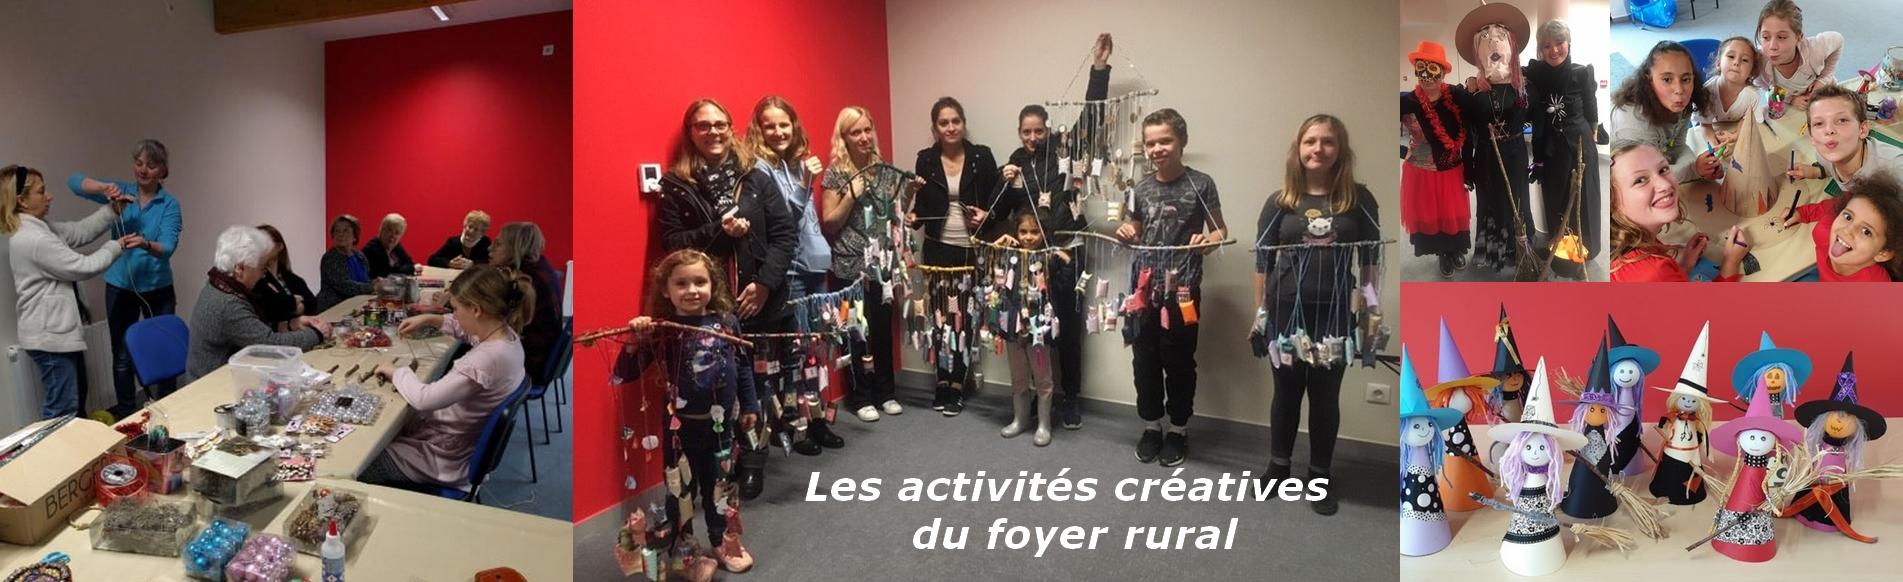 Les activités créatives du foyer rural